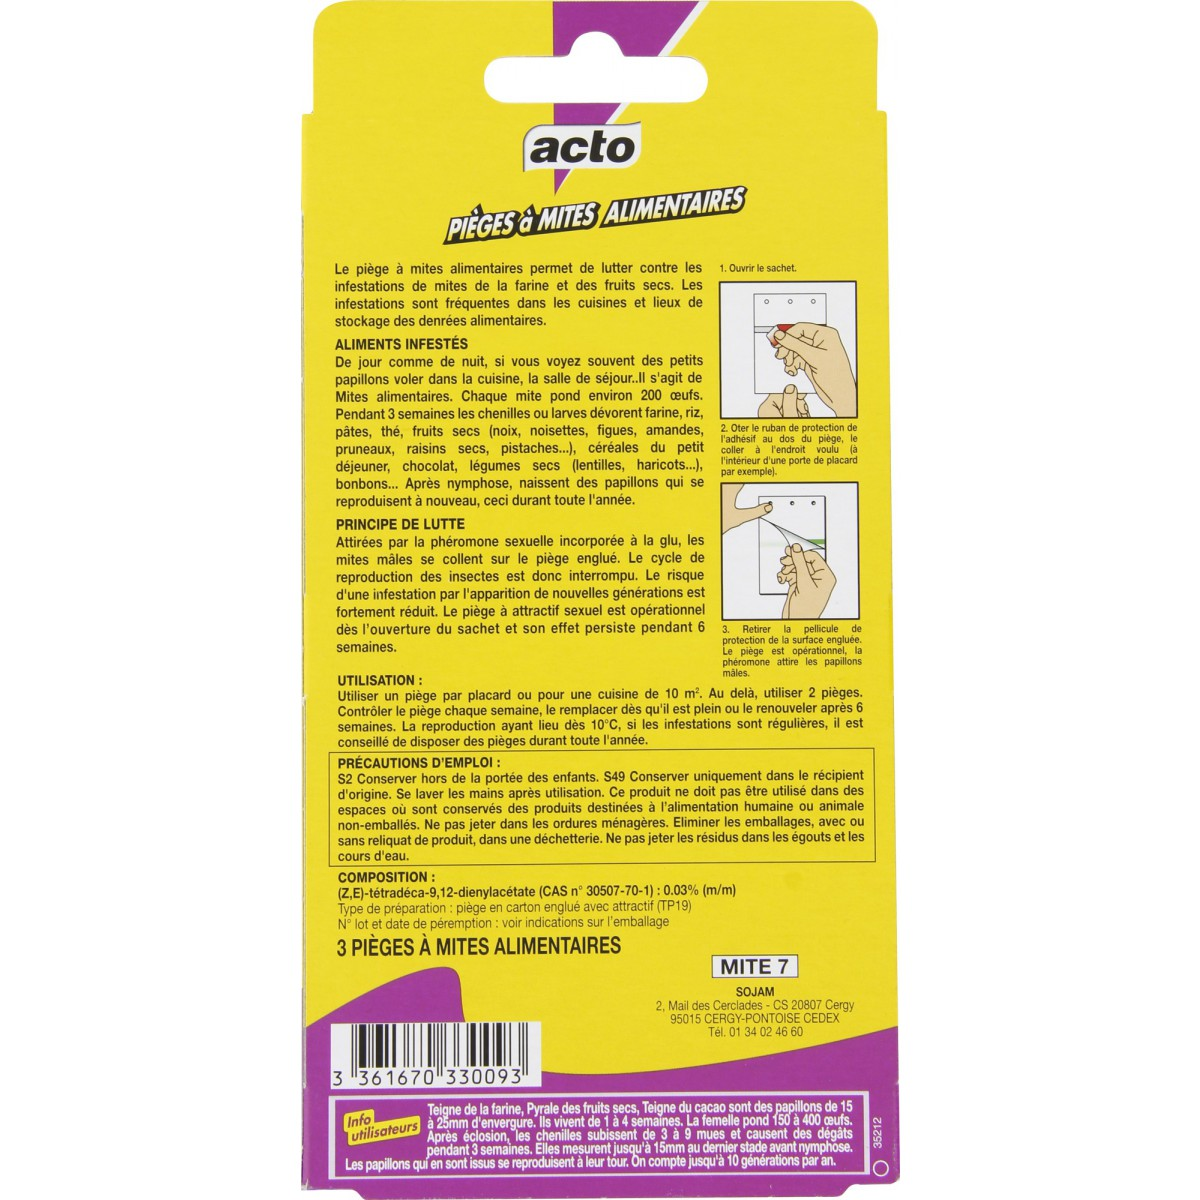 Piège anti-mites alimentaires acto - 3 pièges